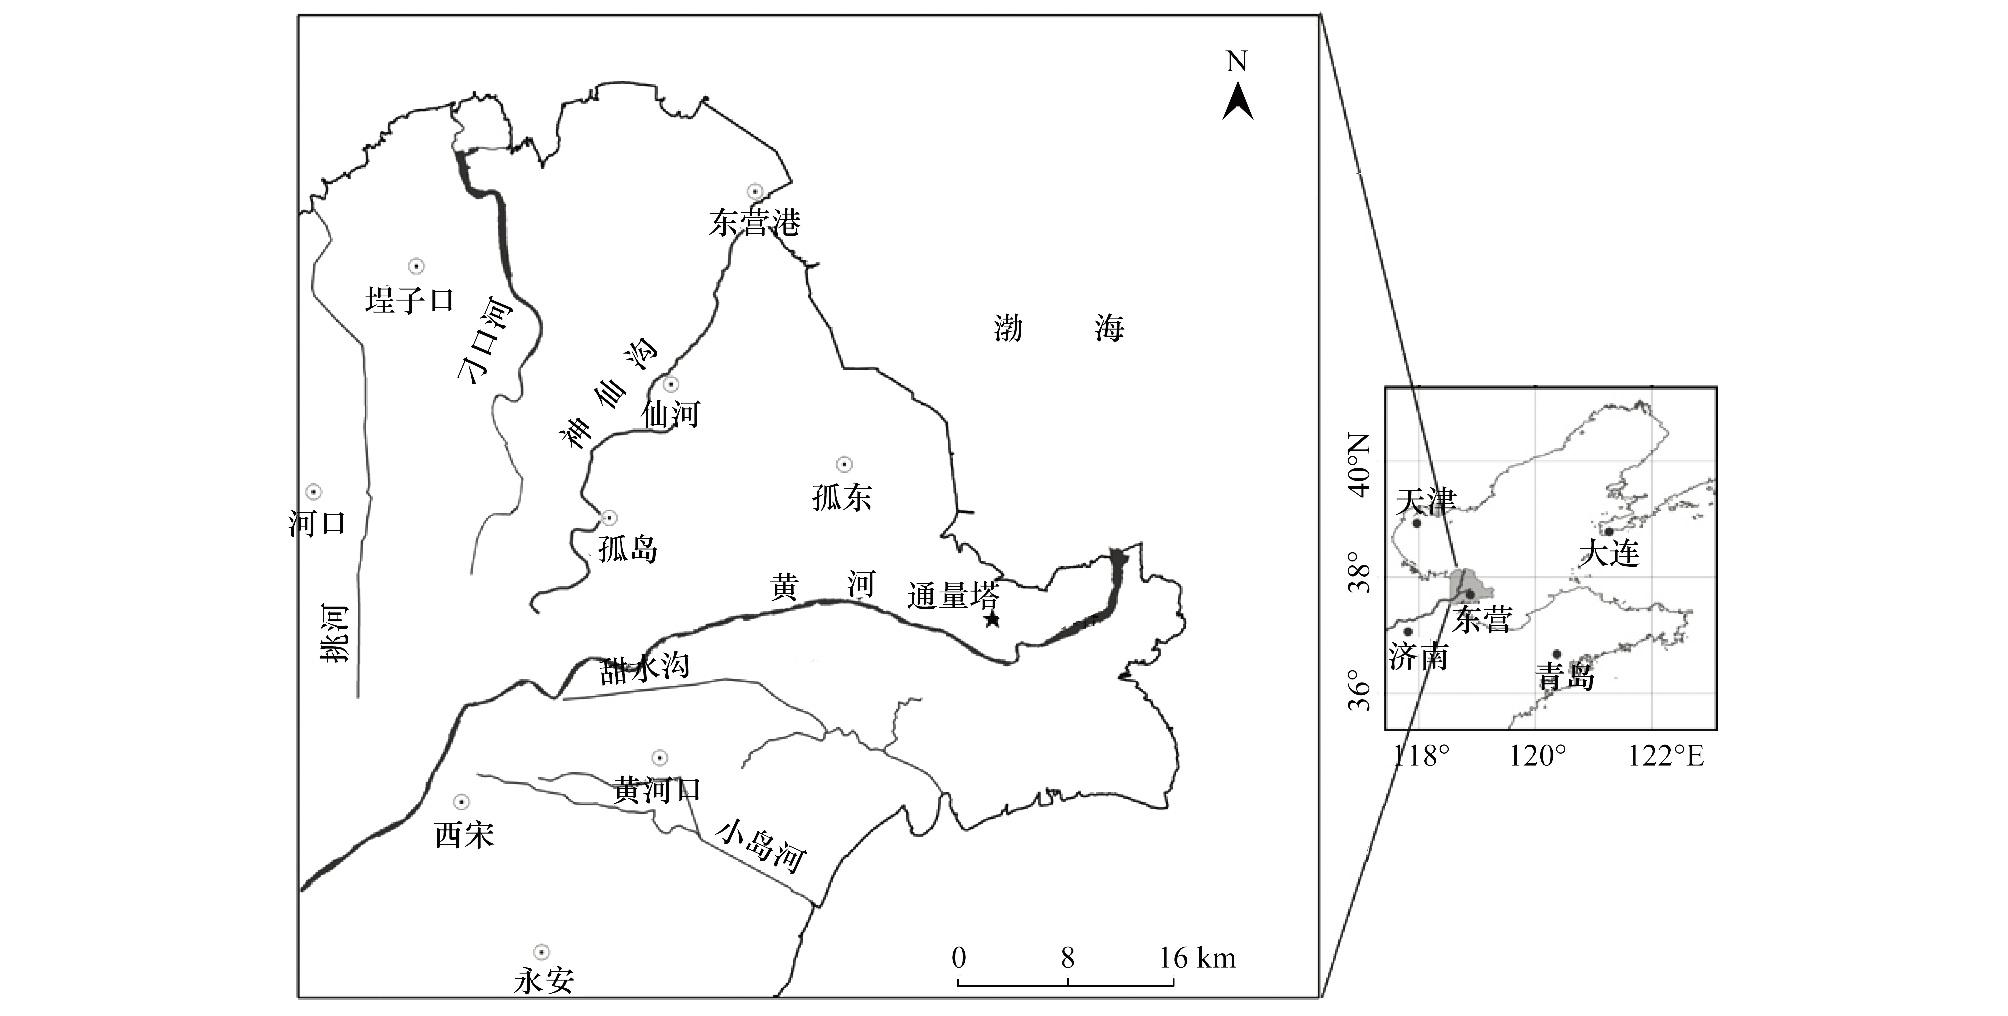 O分析仪(LI-7550,LI-Cor,USA)和三维超声风速仪(GILL-WM,LI-Cor,USA)组成,采样频率为10 Hz,每30 min输出平均值。同时,测定了距地面2.8 m和2 m的光合有效辐射(LI-190SL,LI-Cor,USA)和四分量净辐射(NR01,LI-Cor,USA)以及地面以下5、10、20、30、50 cm处的土壤温度(TM-L10,LI-Cor,USA);5、10、20、30、50 cm处土壤体积含水量(EC-5,LI-Cor,USA)等环境因子。另外,该观测系统的能量